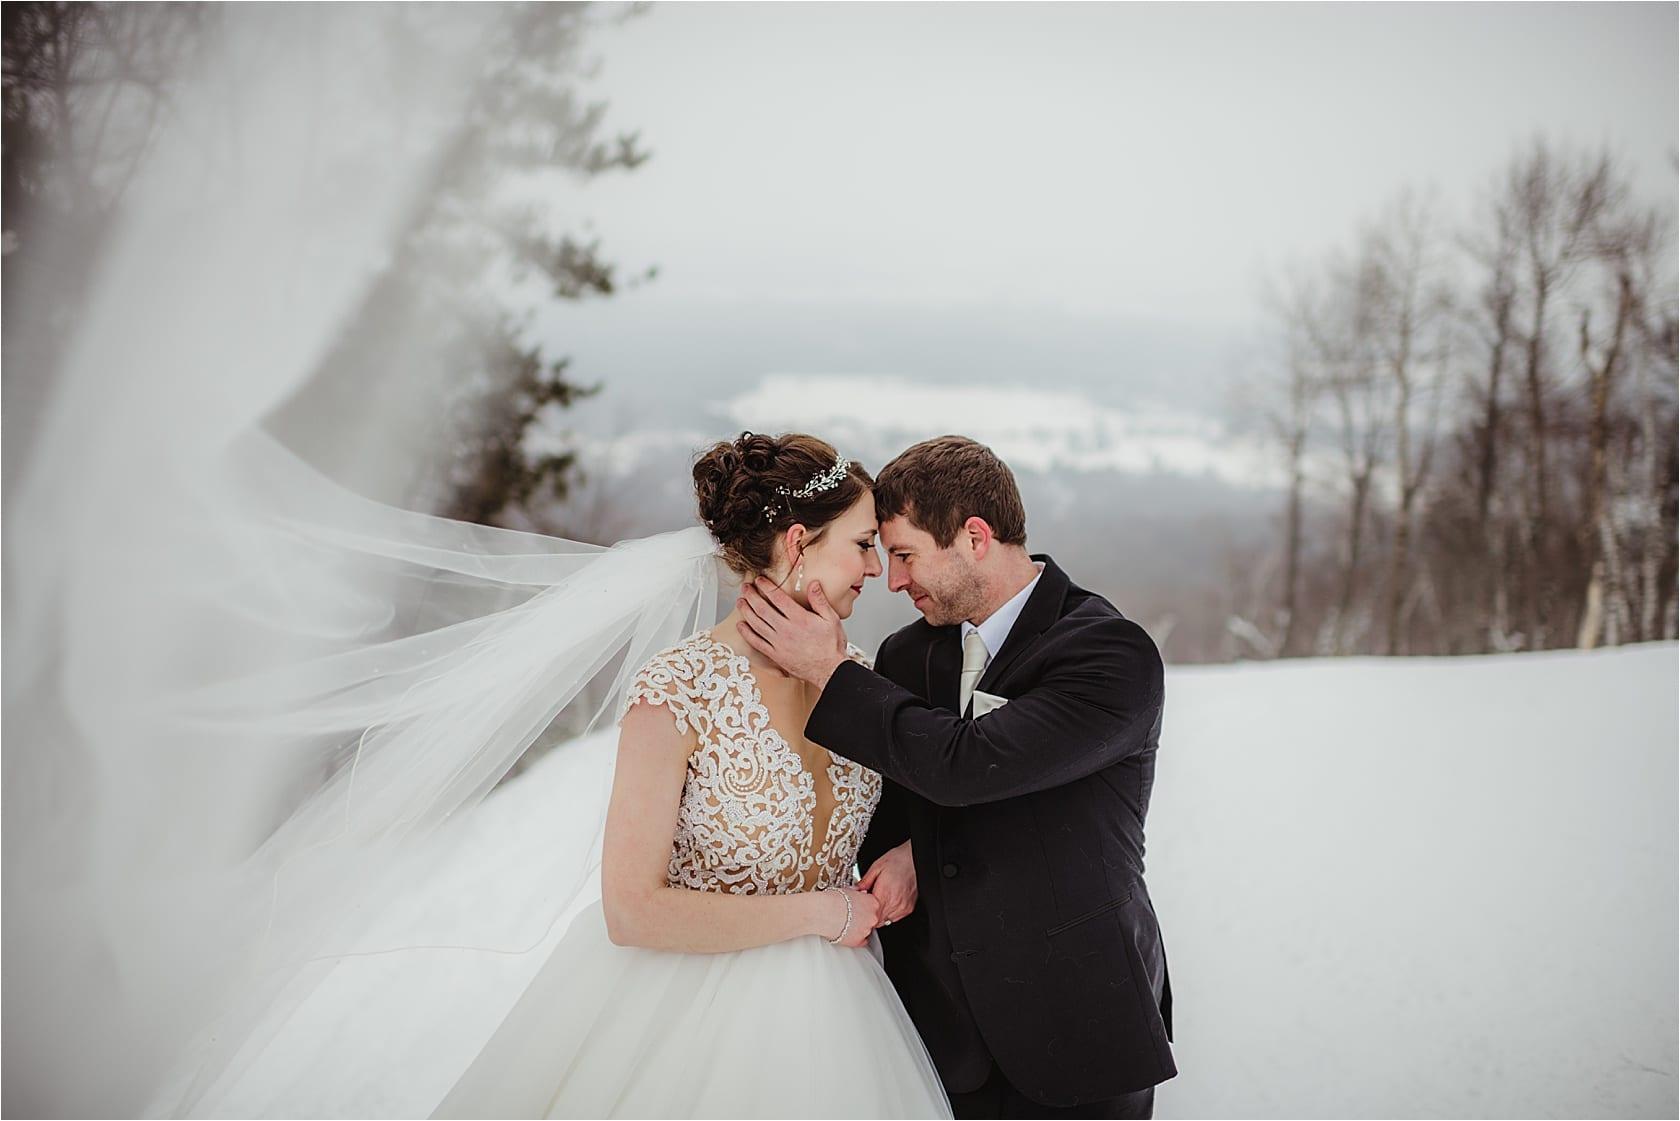 Wausau. Wisconsin Snow Filled Winter Wedding   The Jefferson Street Inn